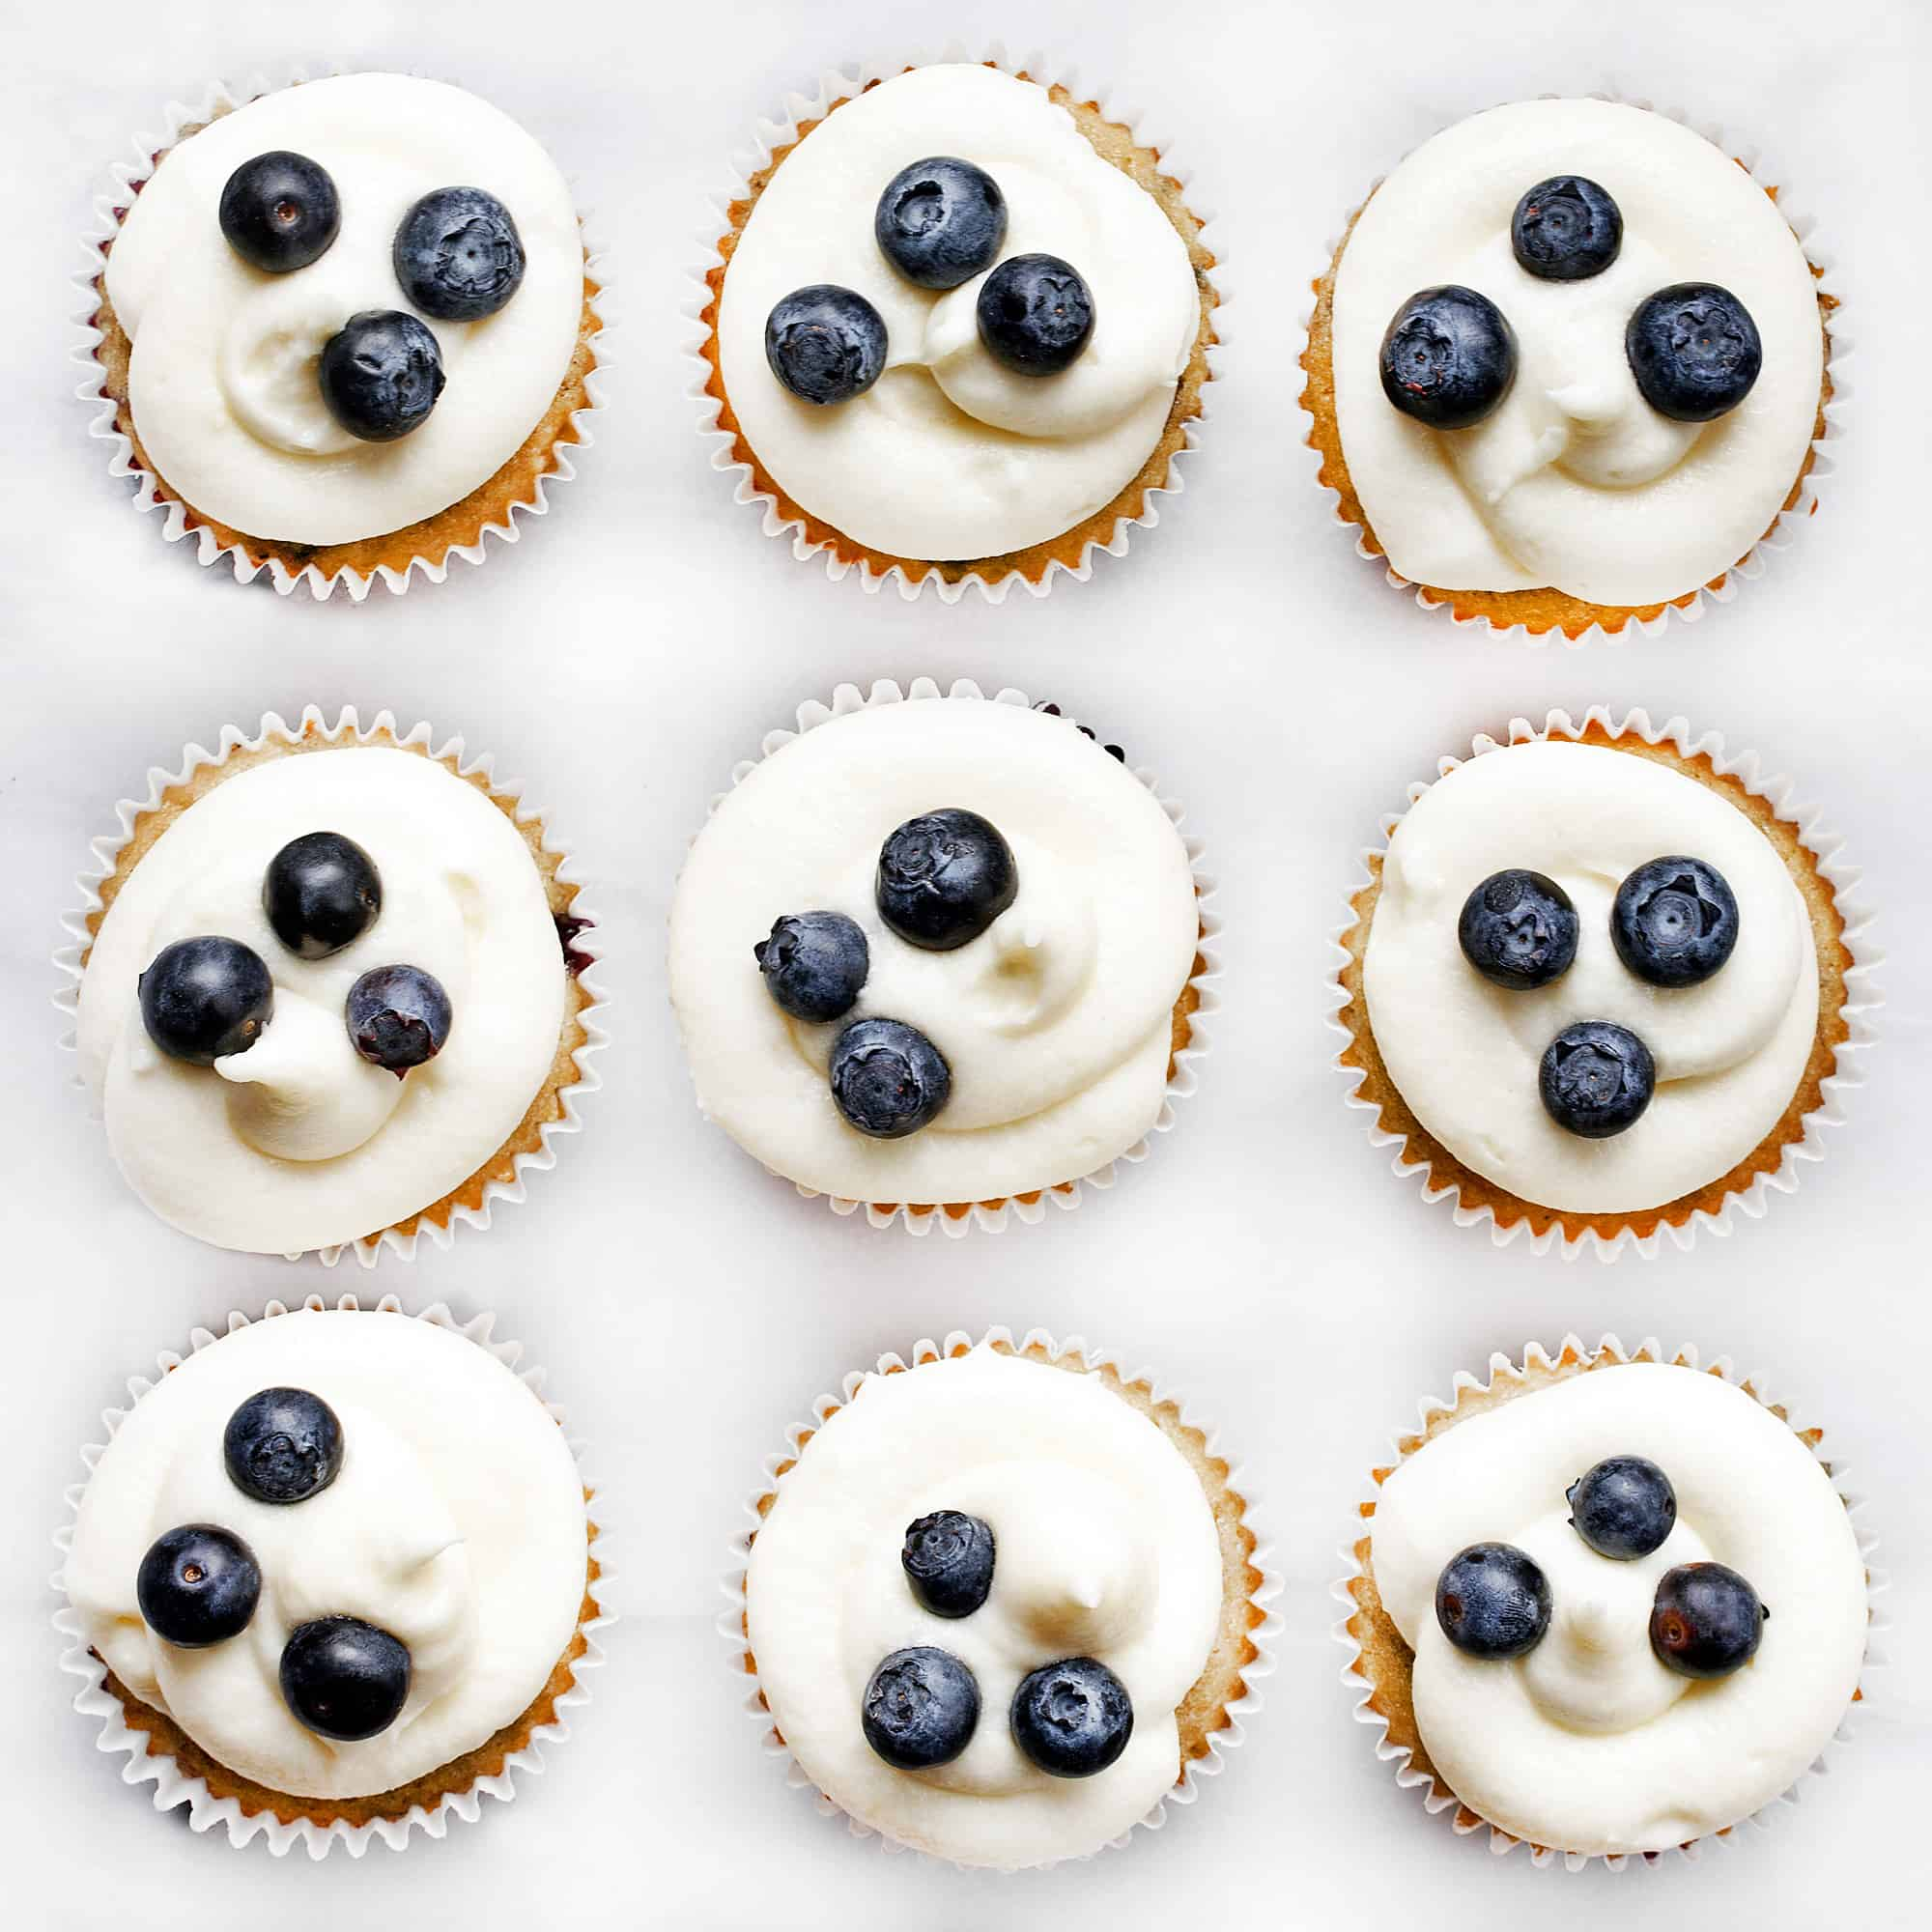 Blueberry Lemon Cupcakes4